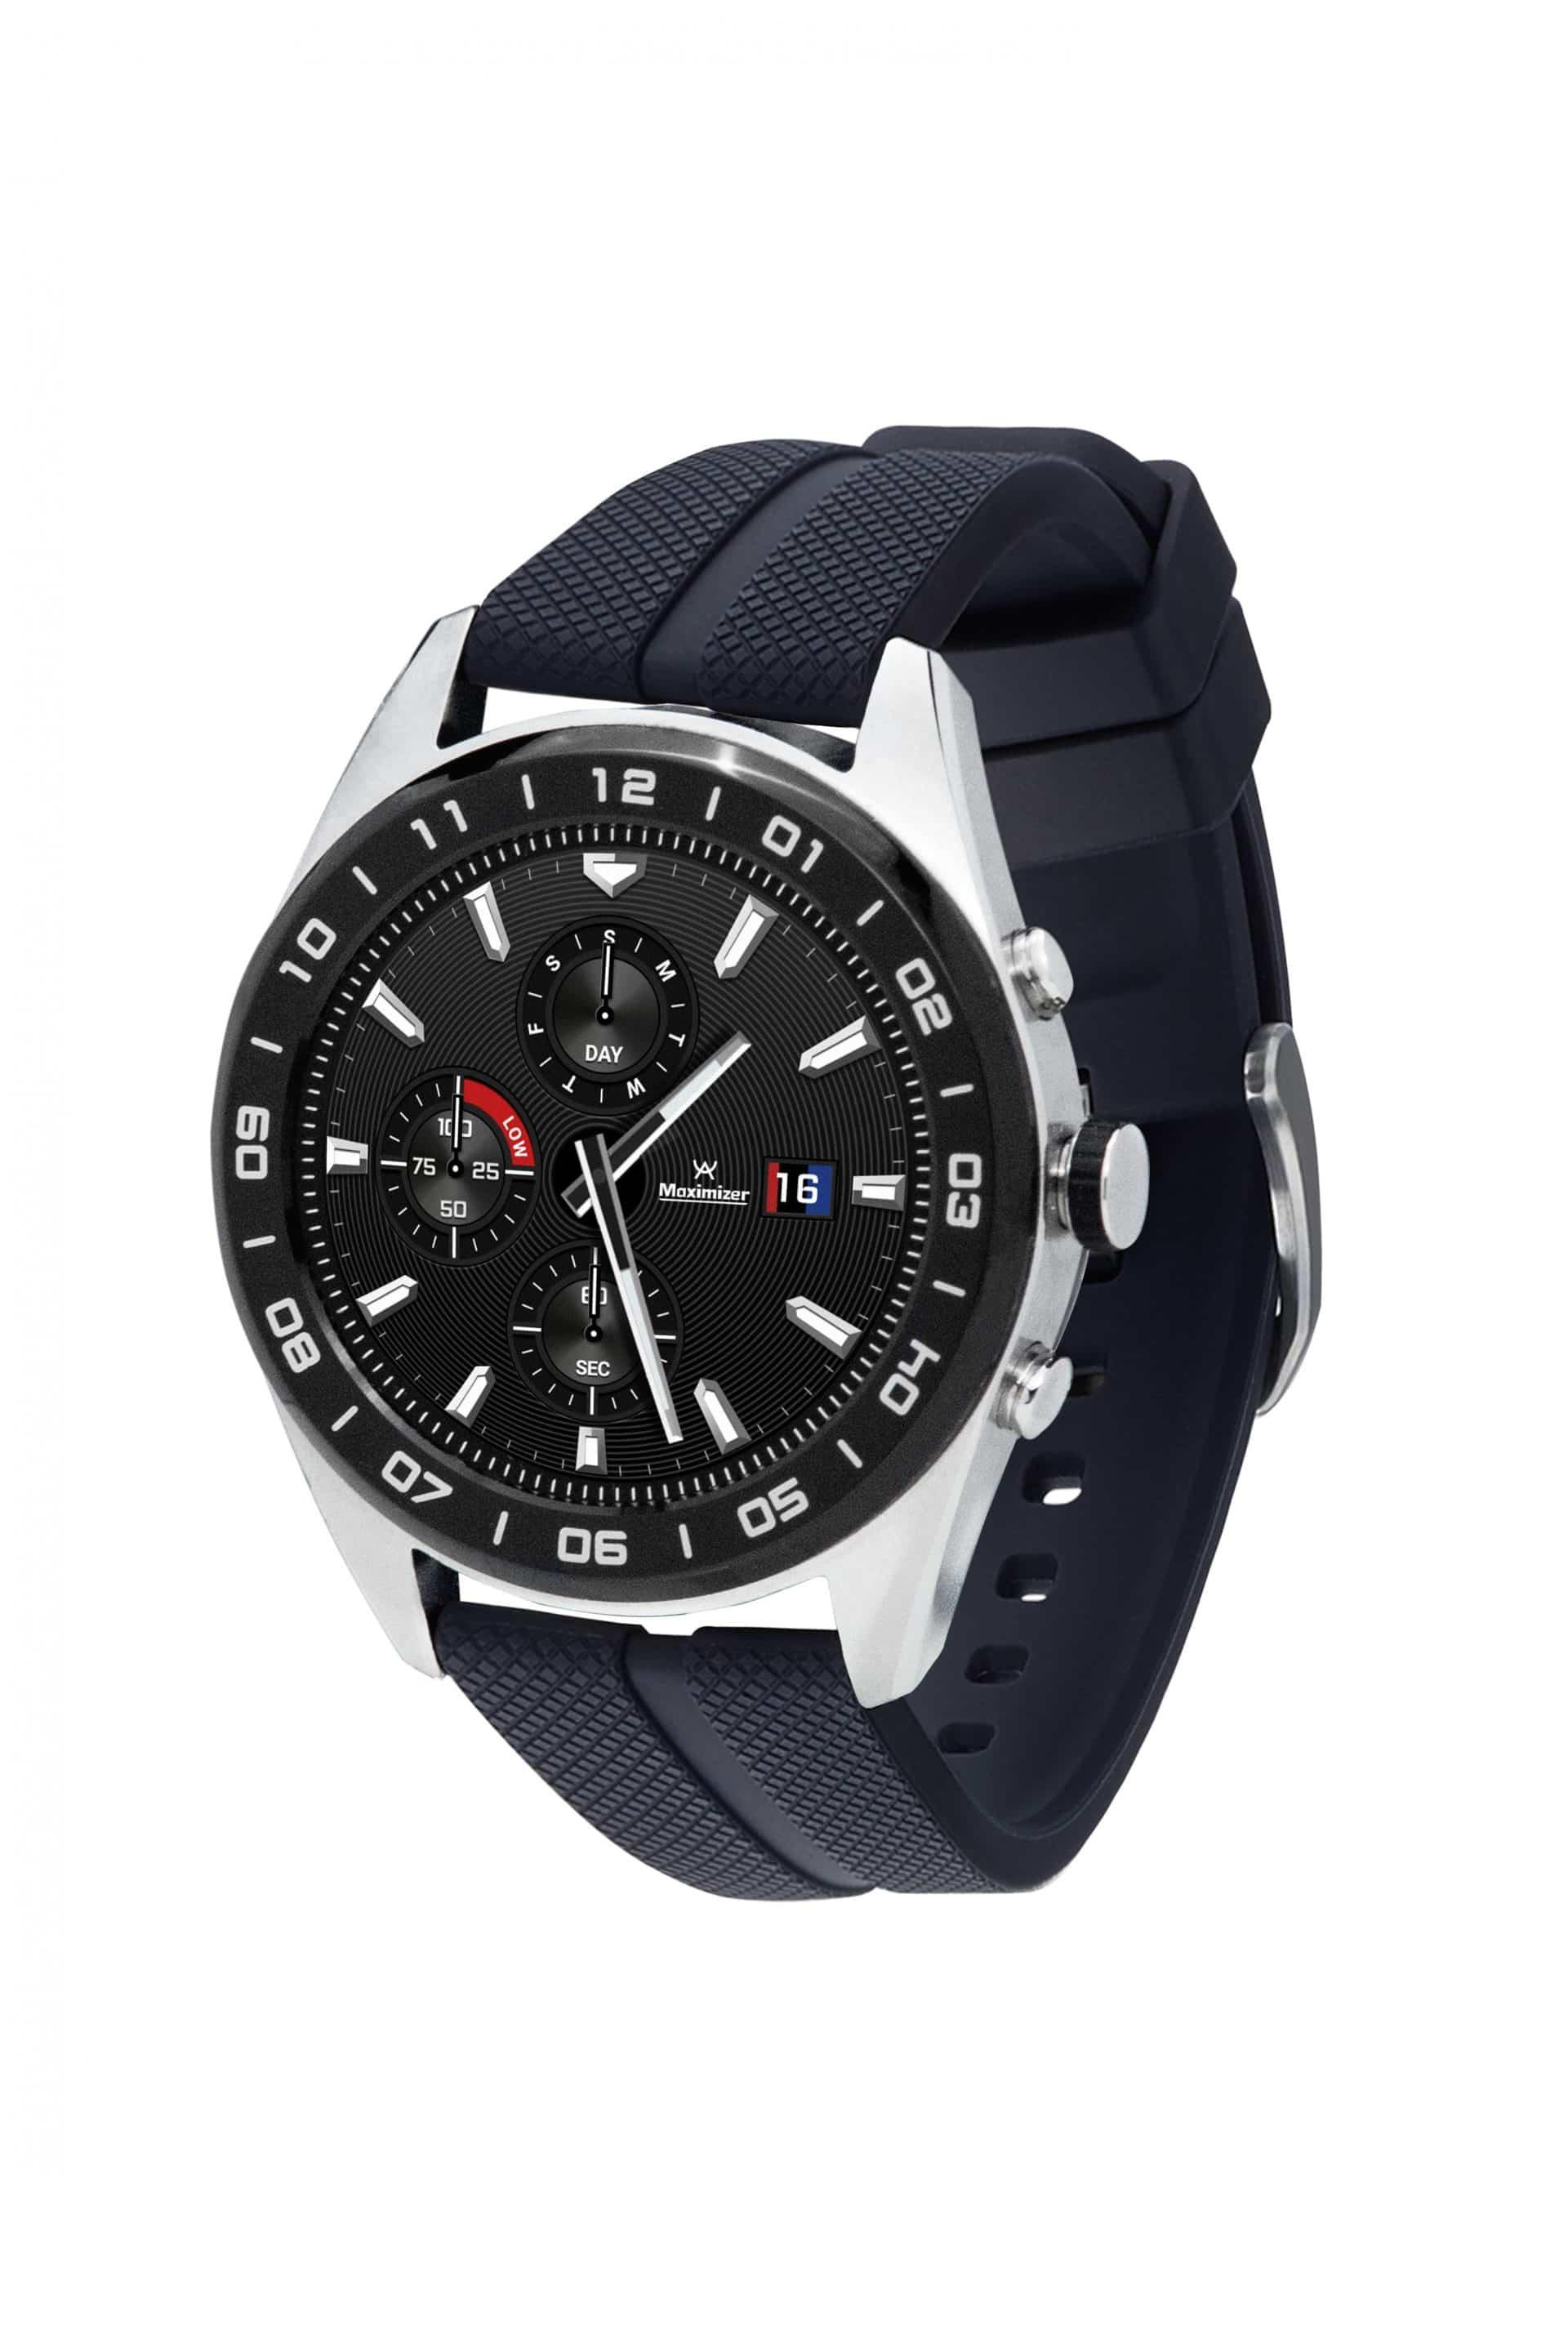 LG Watch W7 Smartwatch by Wear OS left angle